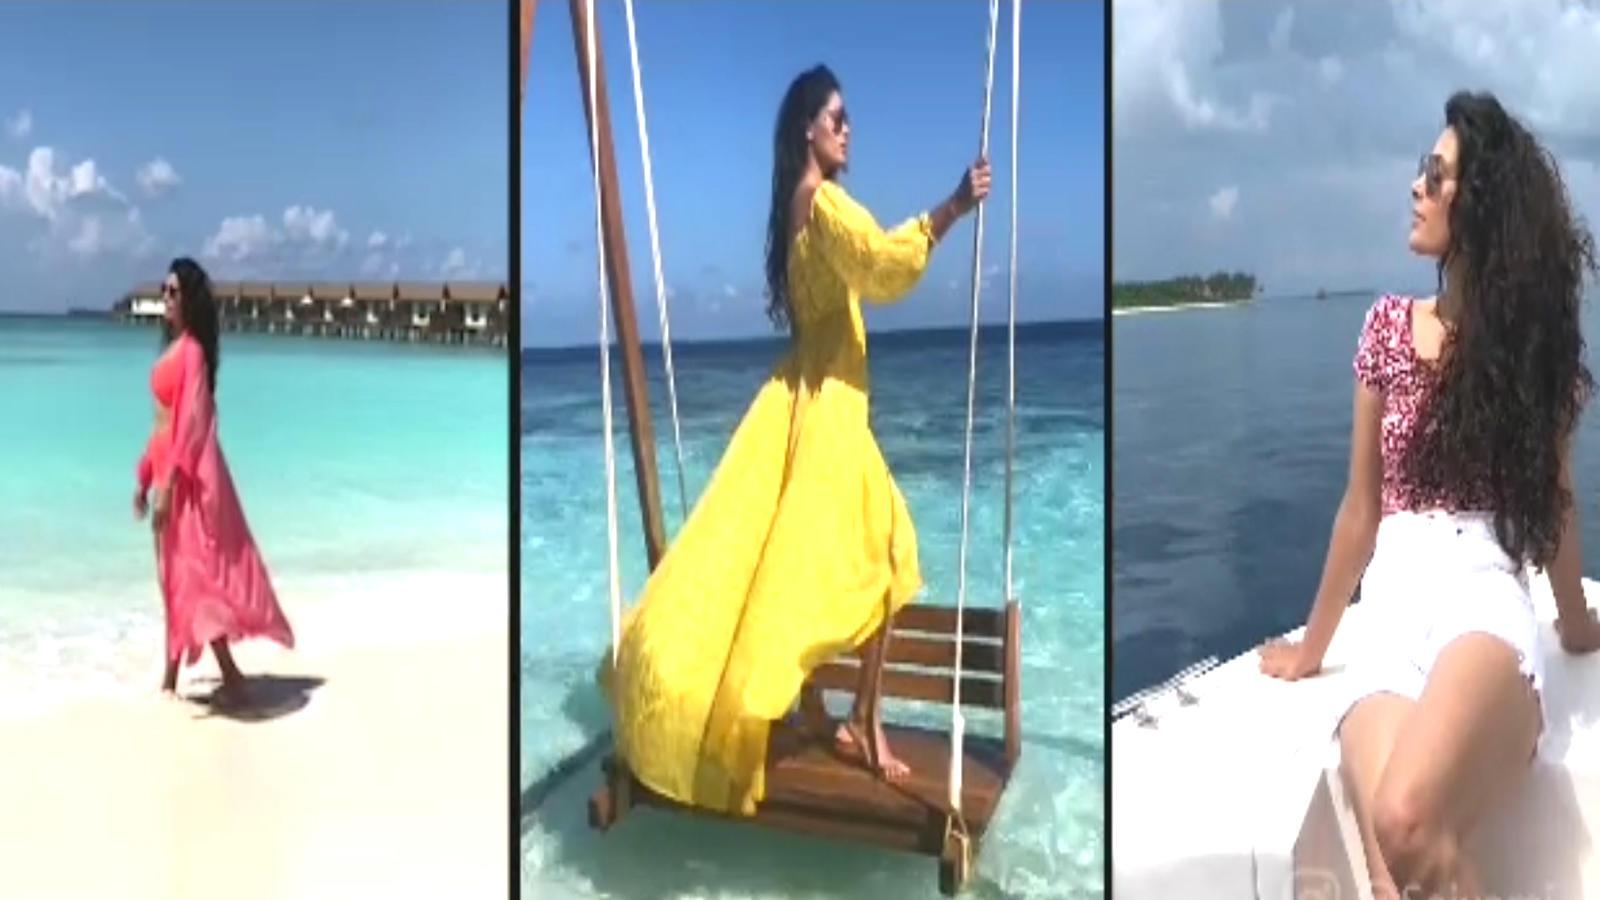 saiyami-kher-on-a-much-needed-break-in-maldives